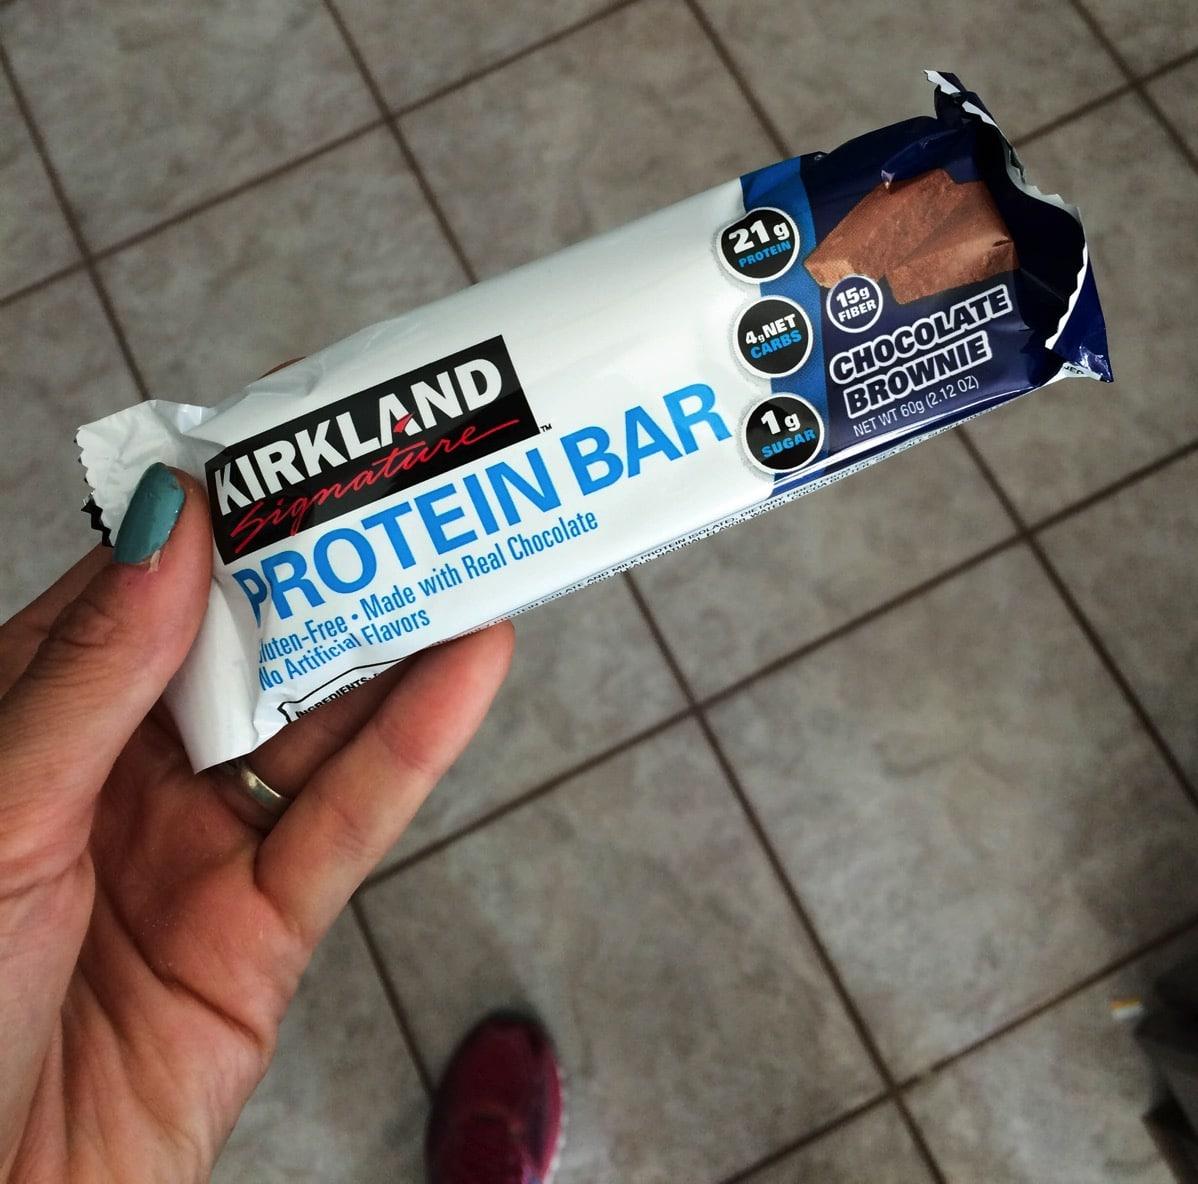 Kirklandprotein bar